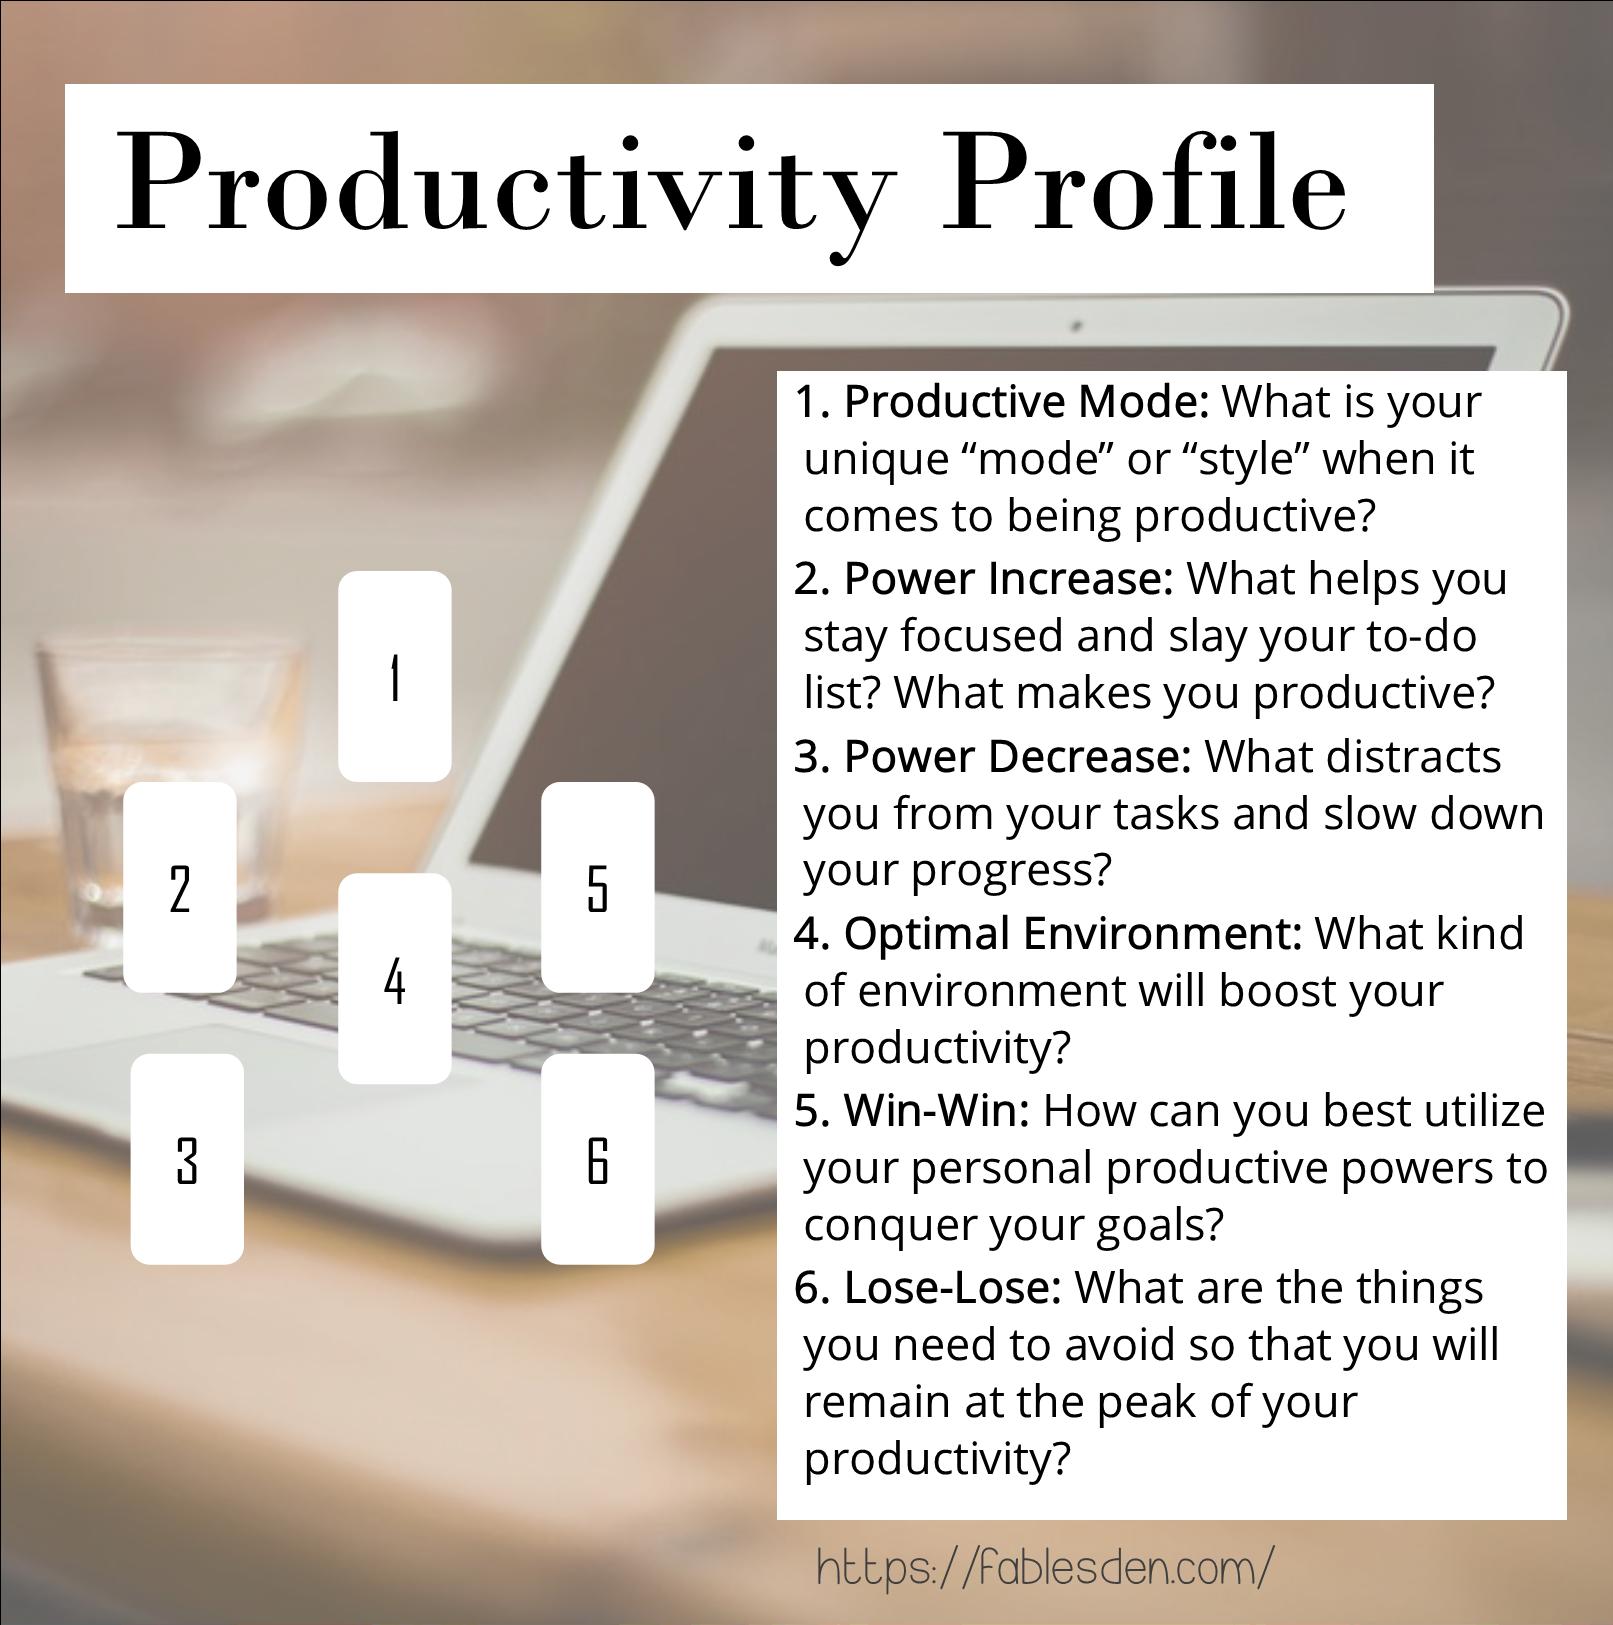 Productivity Profile Spread.png